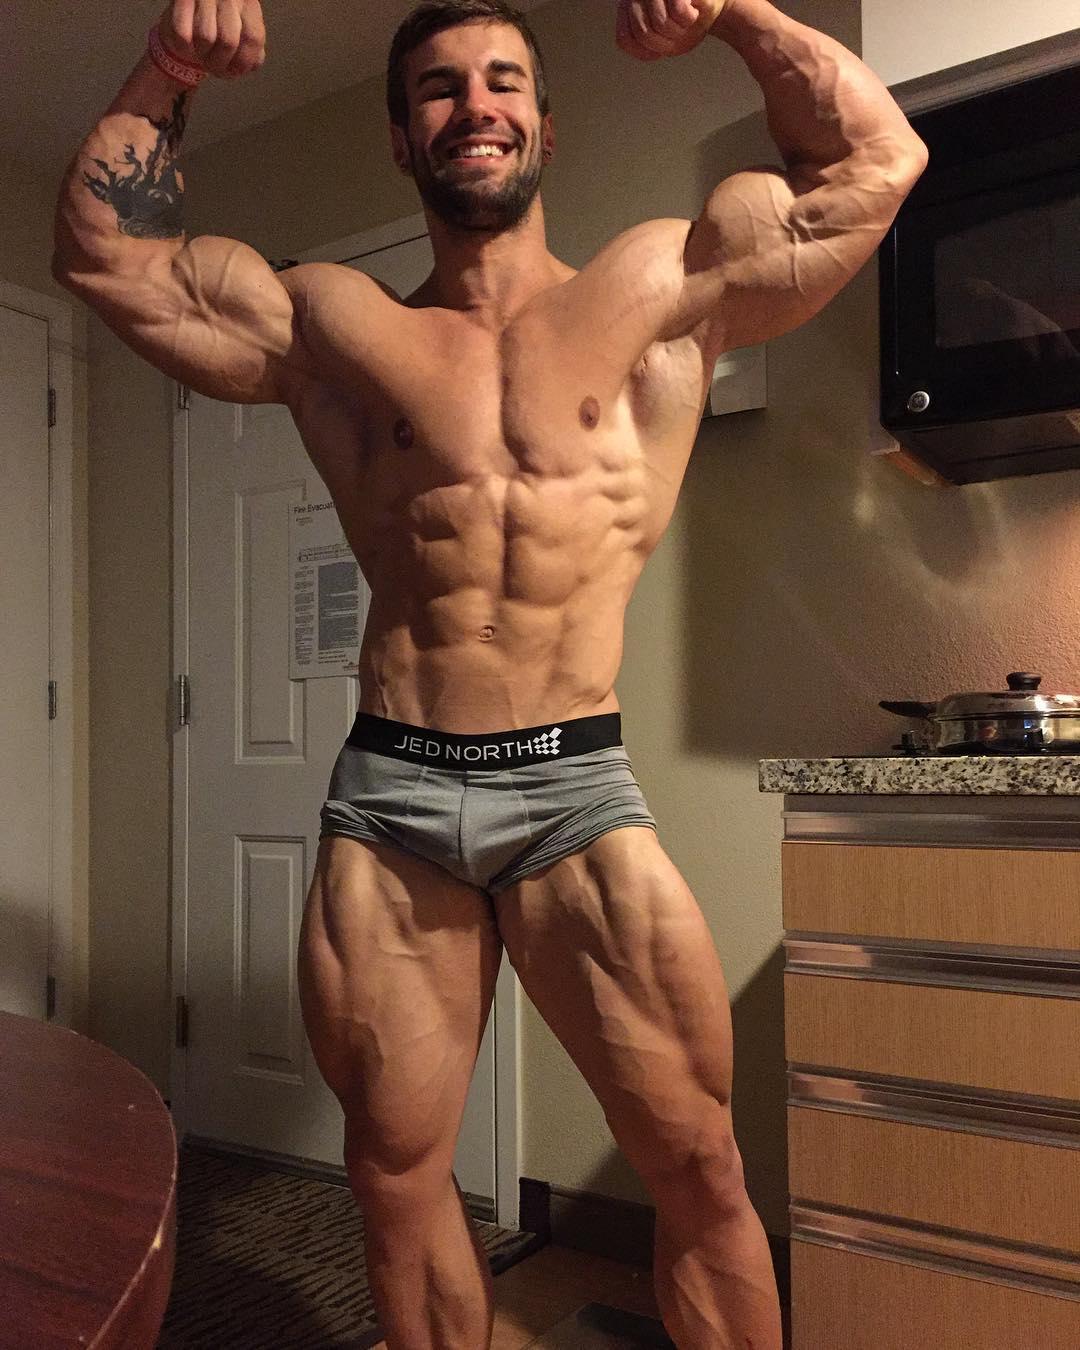 BUILD BODY WORKS: Fitness Model Jake Burton